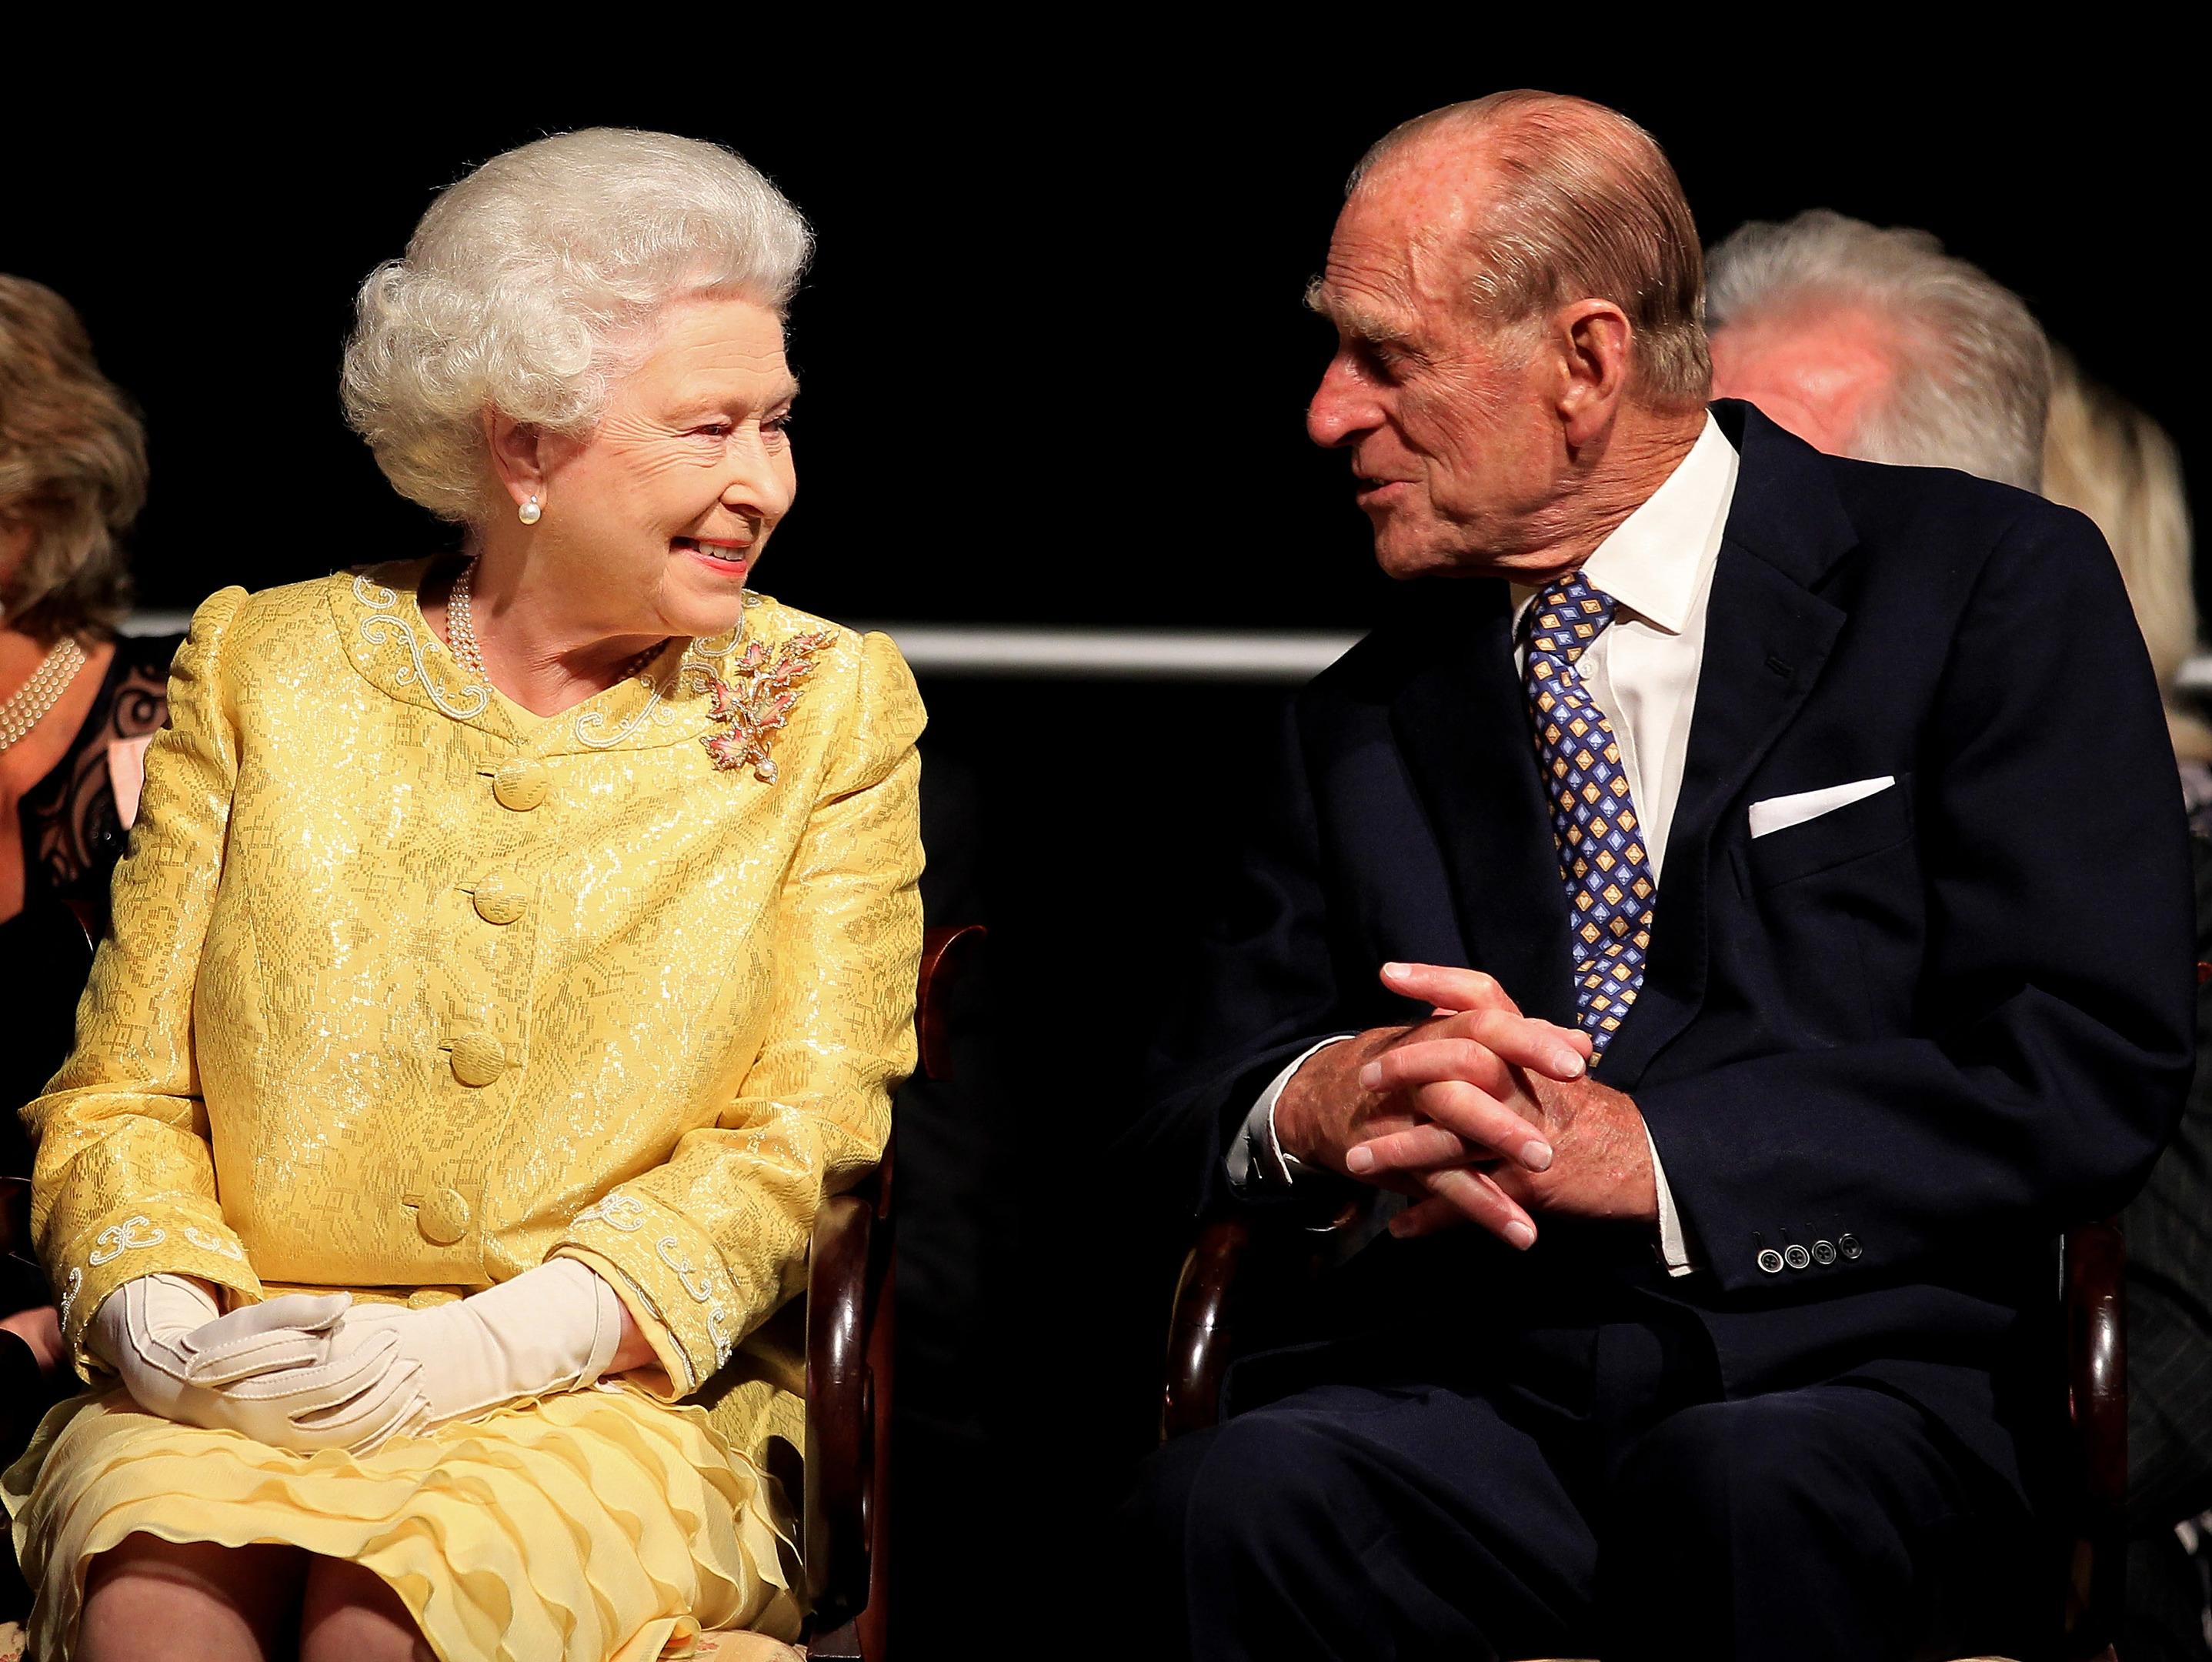 Queen Elizabeth II and Prince Philip, Duke of Edinburgh (Chris Jackson-Pool/Getty Images)